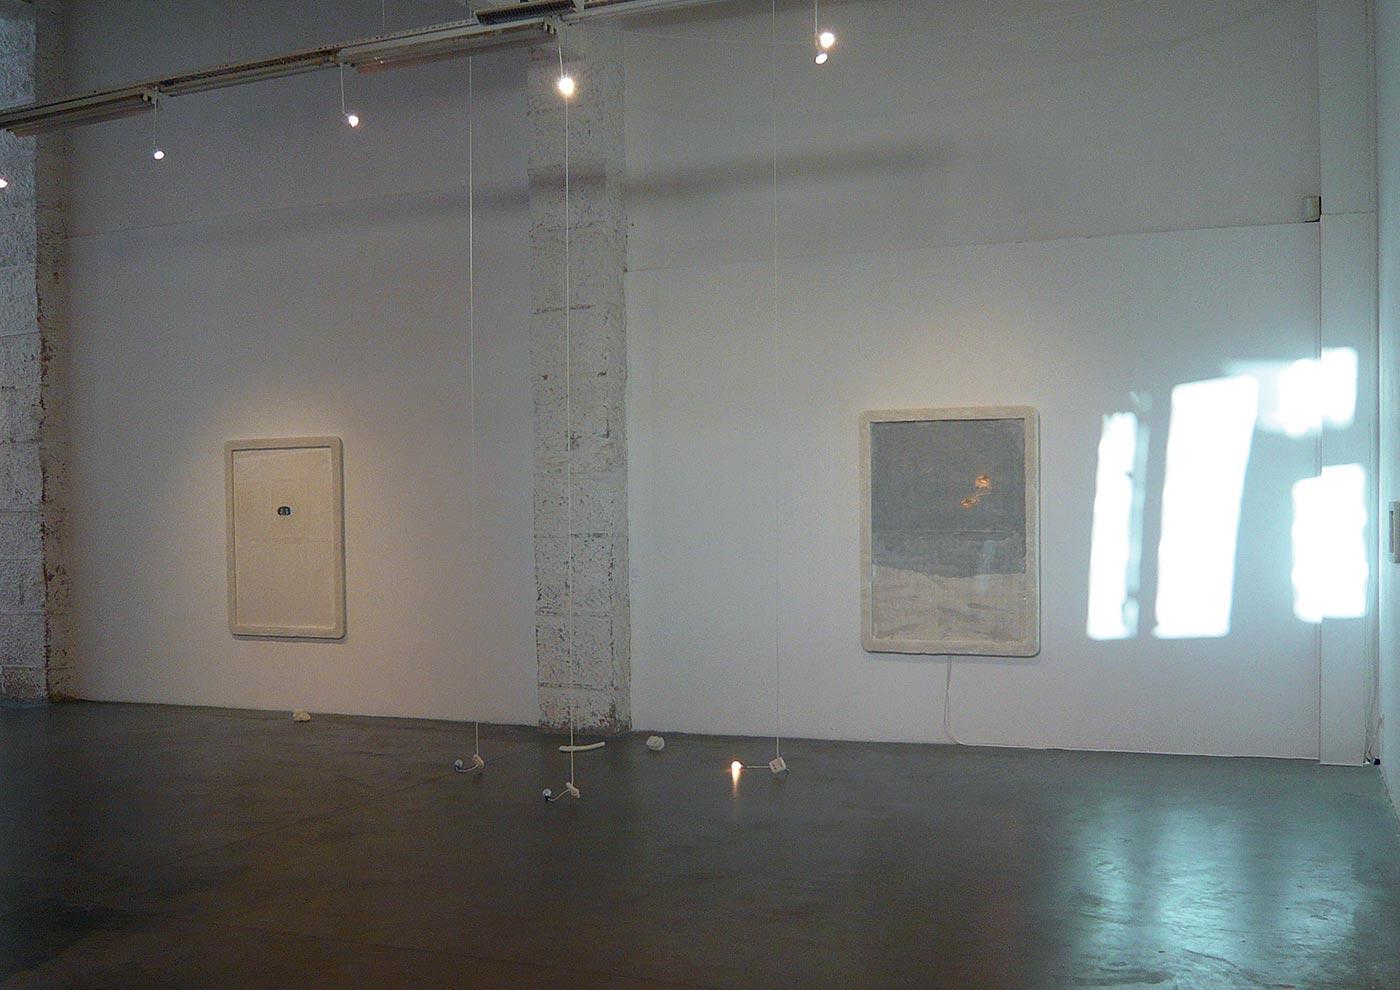 sea salt, chemical compounds, electricity. Installation view Atelier Soardi, Nizza. 2008